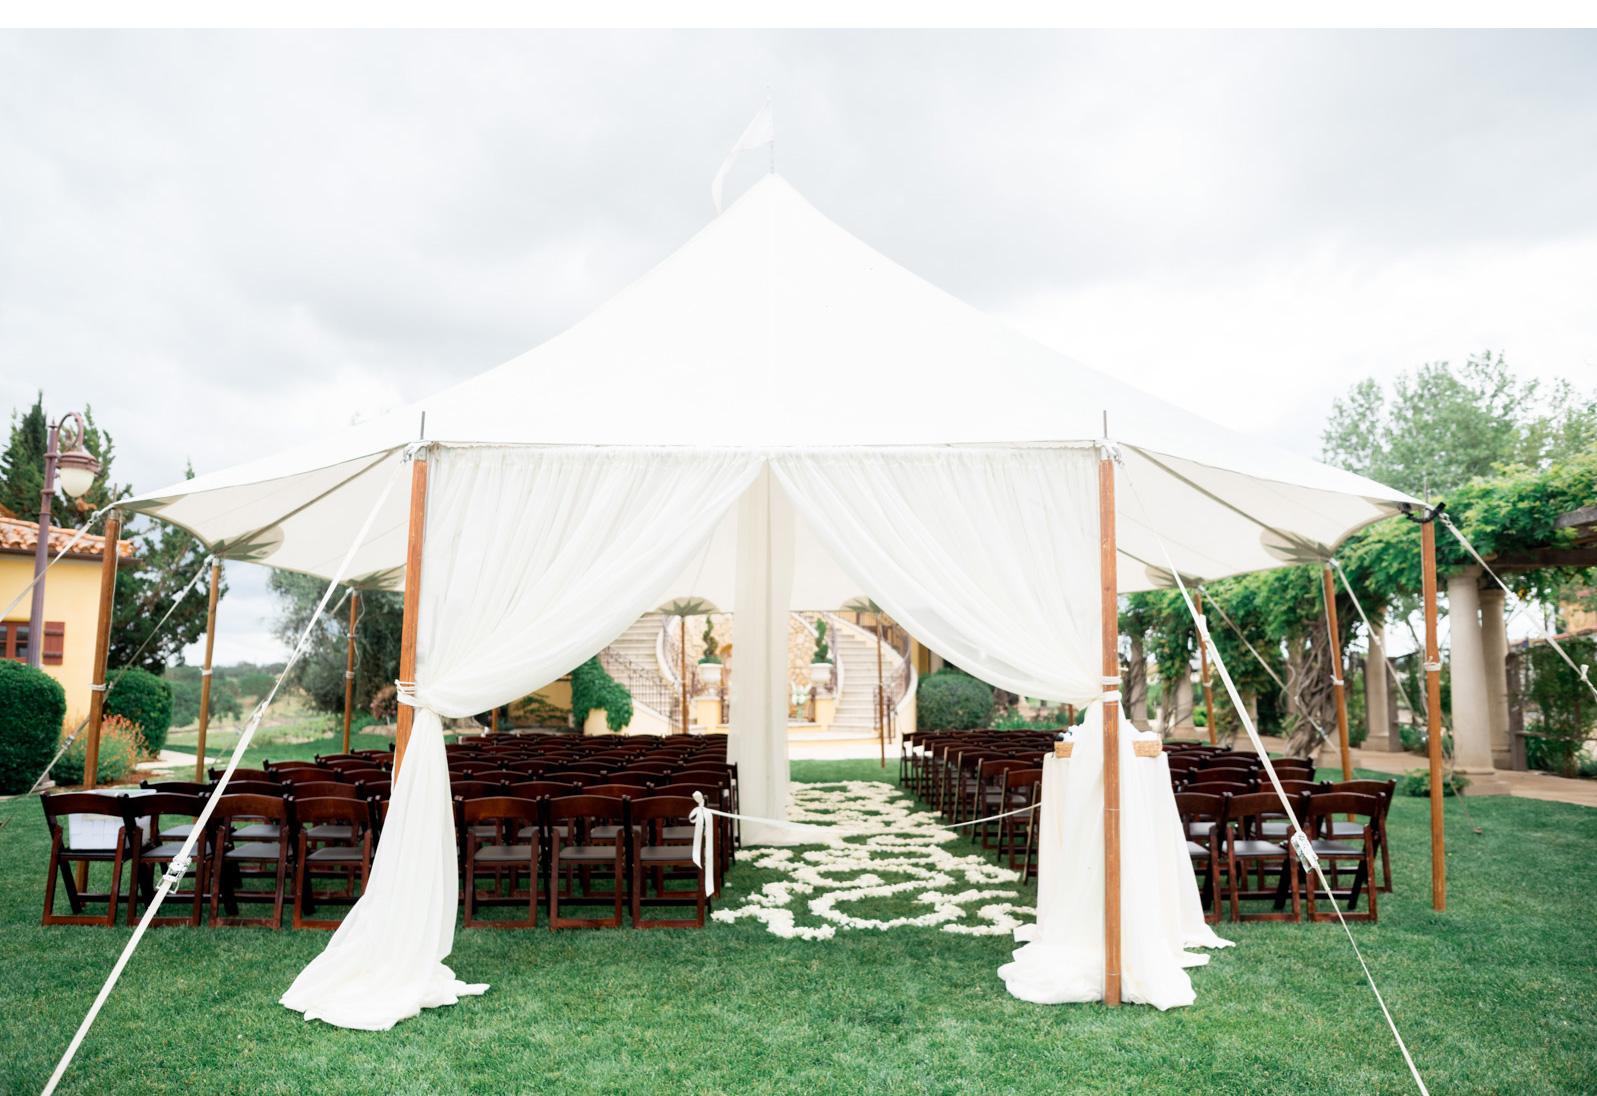 Southern-California-Wedding-Photographer-Natalie-Schutt-Photography_17.jpg